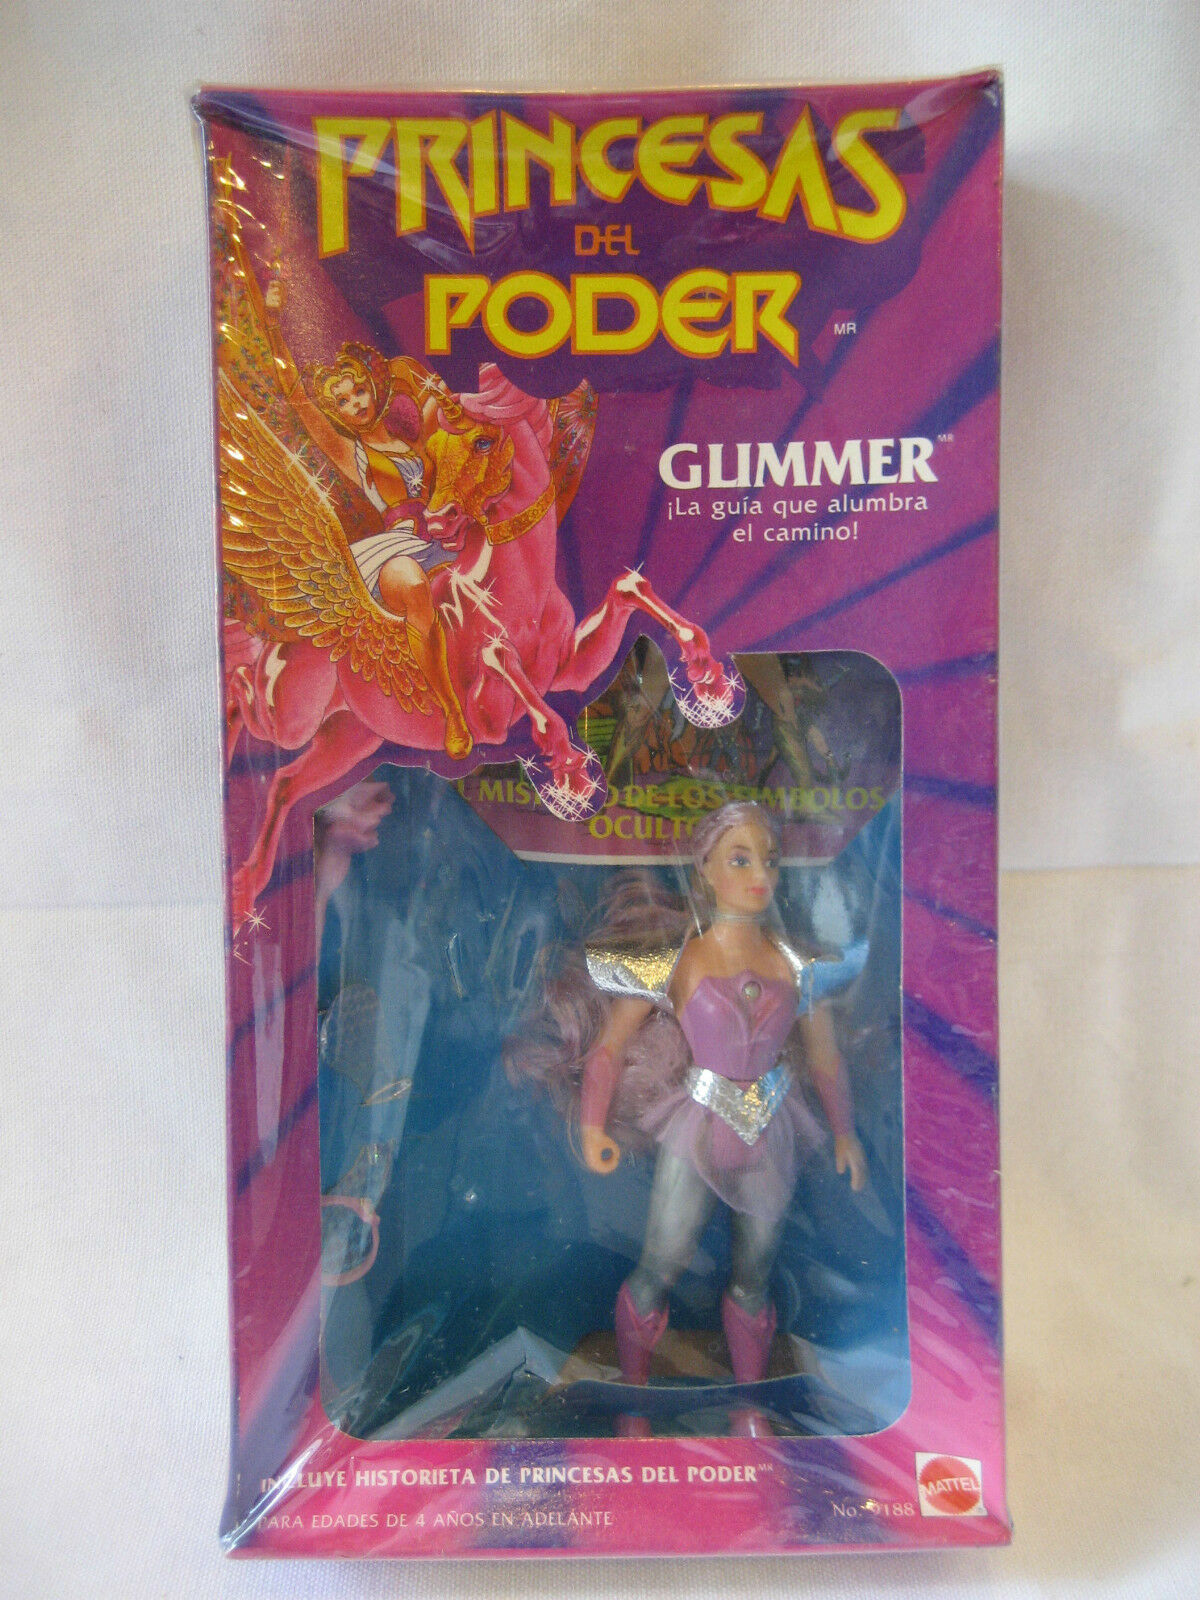 Mattel Glimmer Princesa del poder México Menta en caja Princesas del poder los amos Amos Del Universo